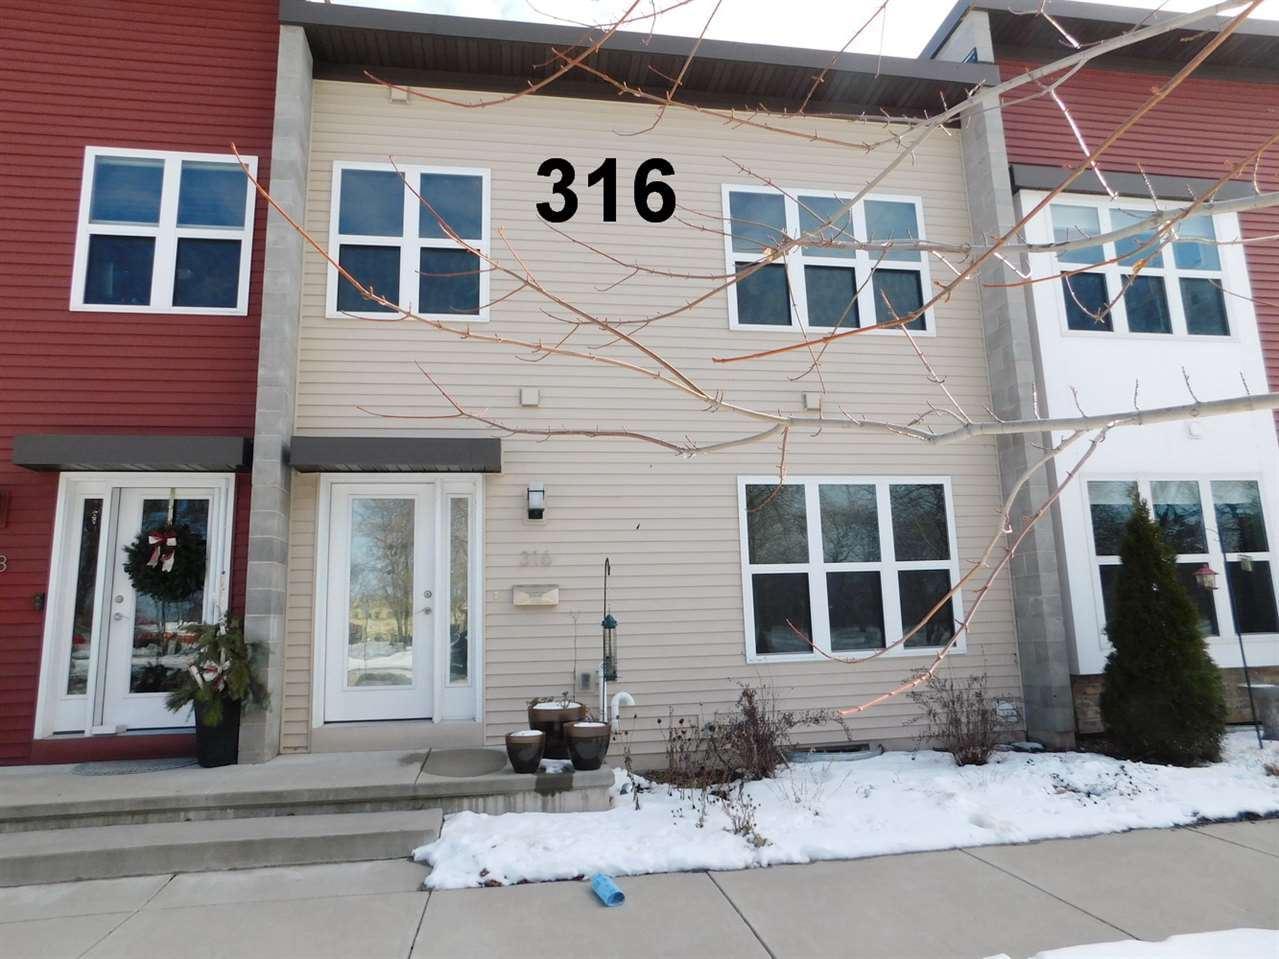 316 N VAN BUREN Street, Green Bay, WI 54301 - MLS#: 50234424